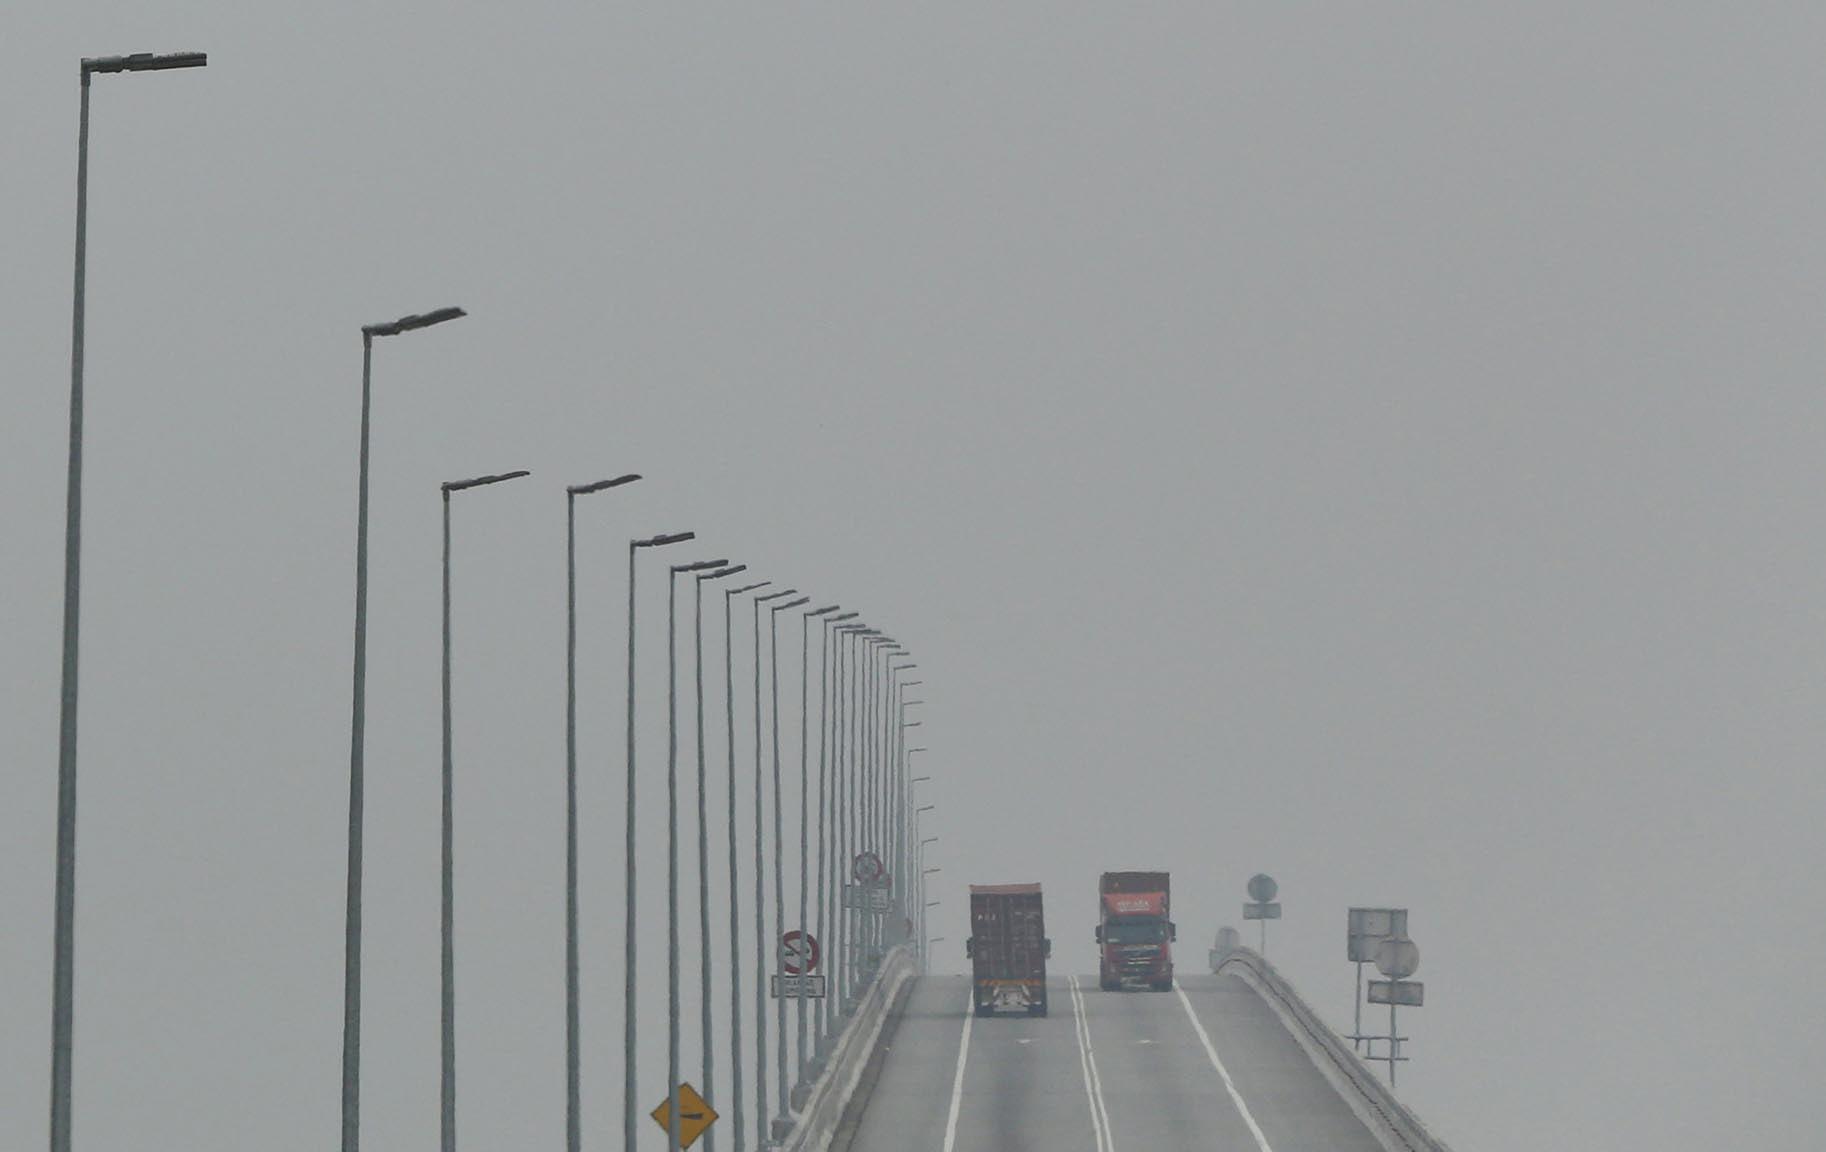 Lorries cross a bridge shrouded in haze in Klang, Malaysia